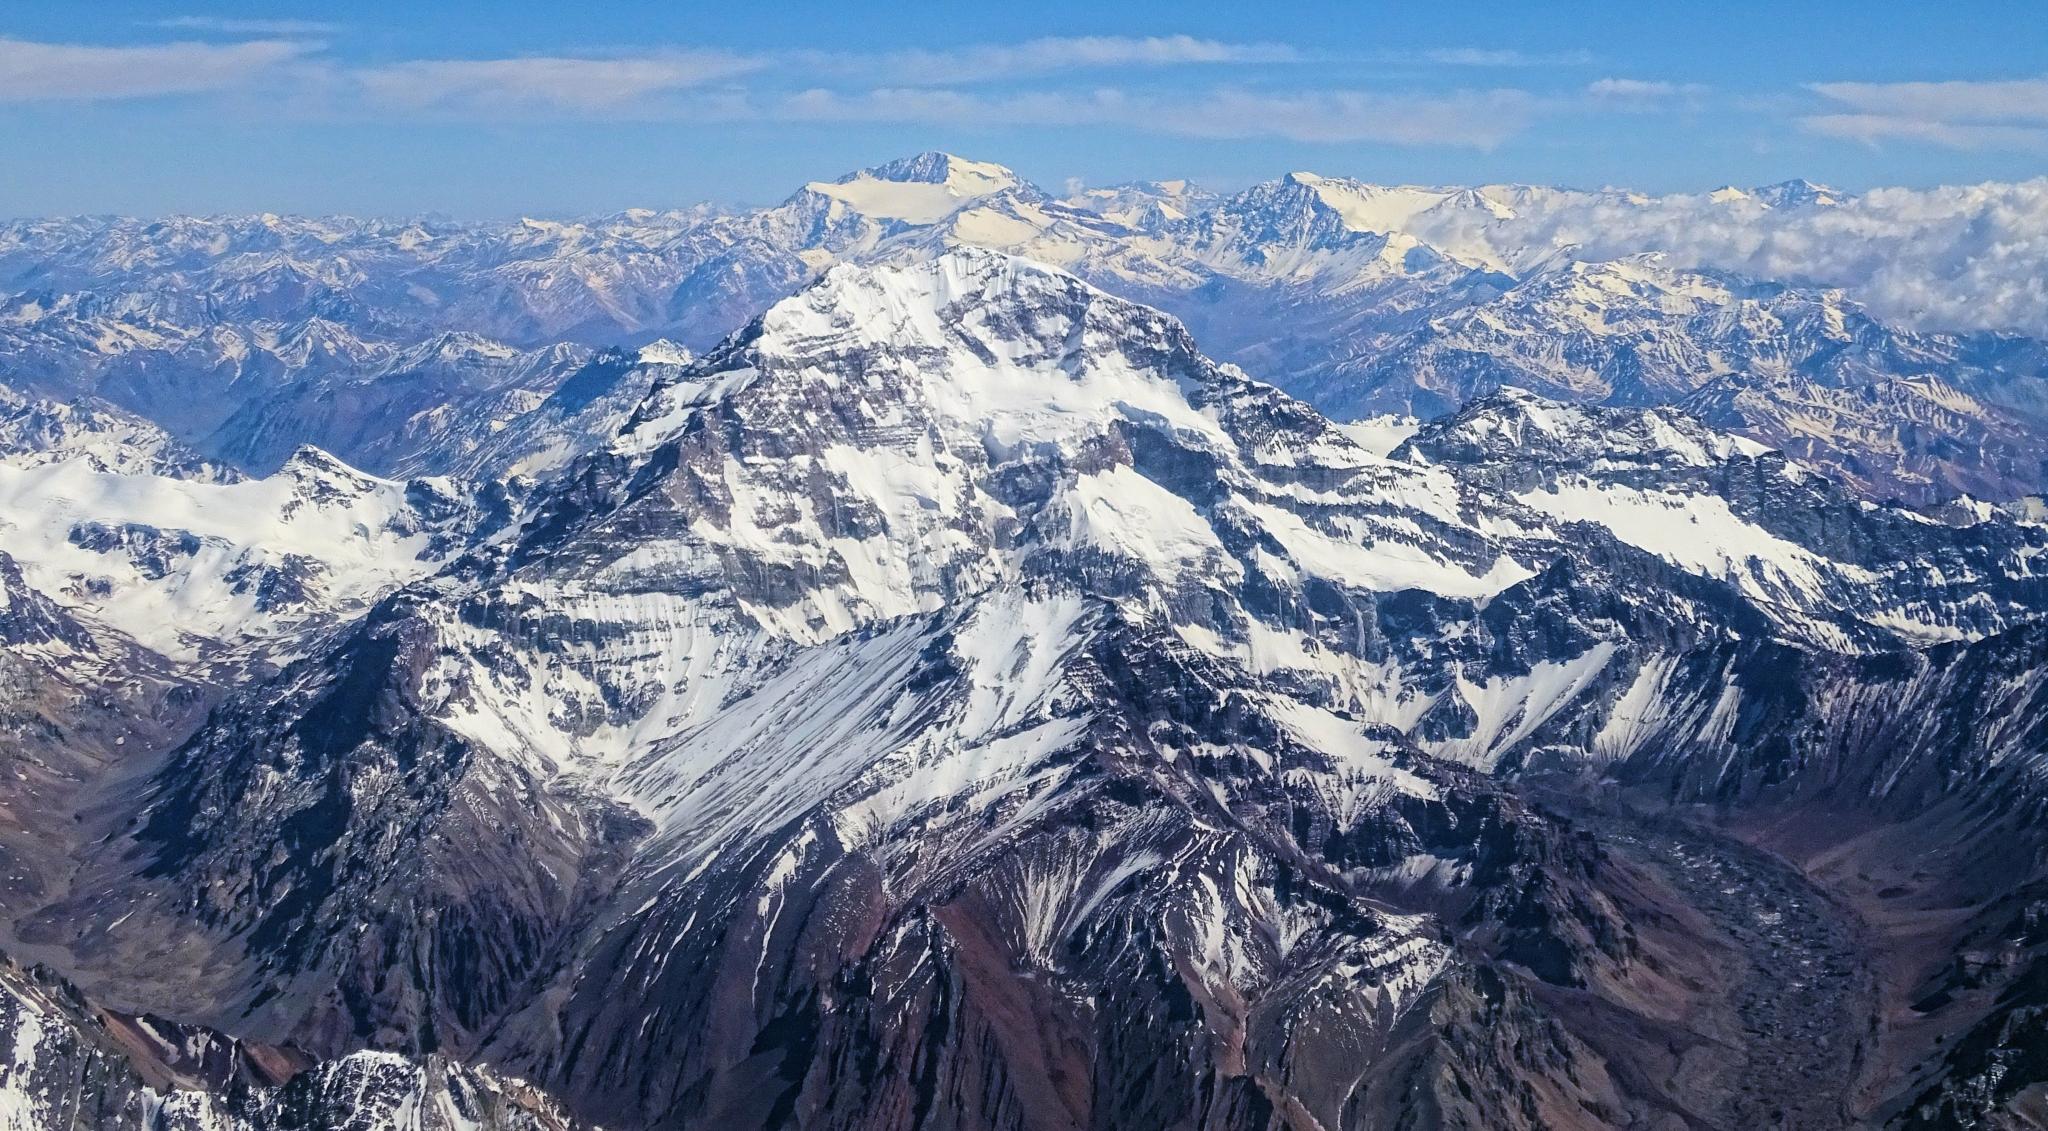 Cordilheira dos Andes, mesmo perdendo pro Everest, deixa outros pontos altos no chinelo